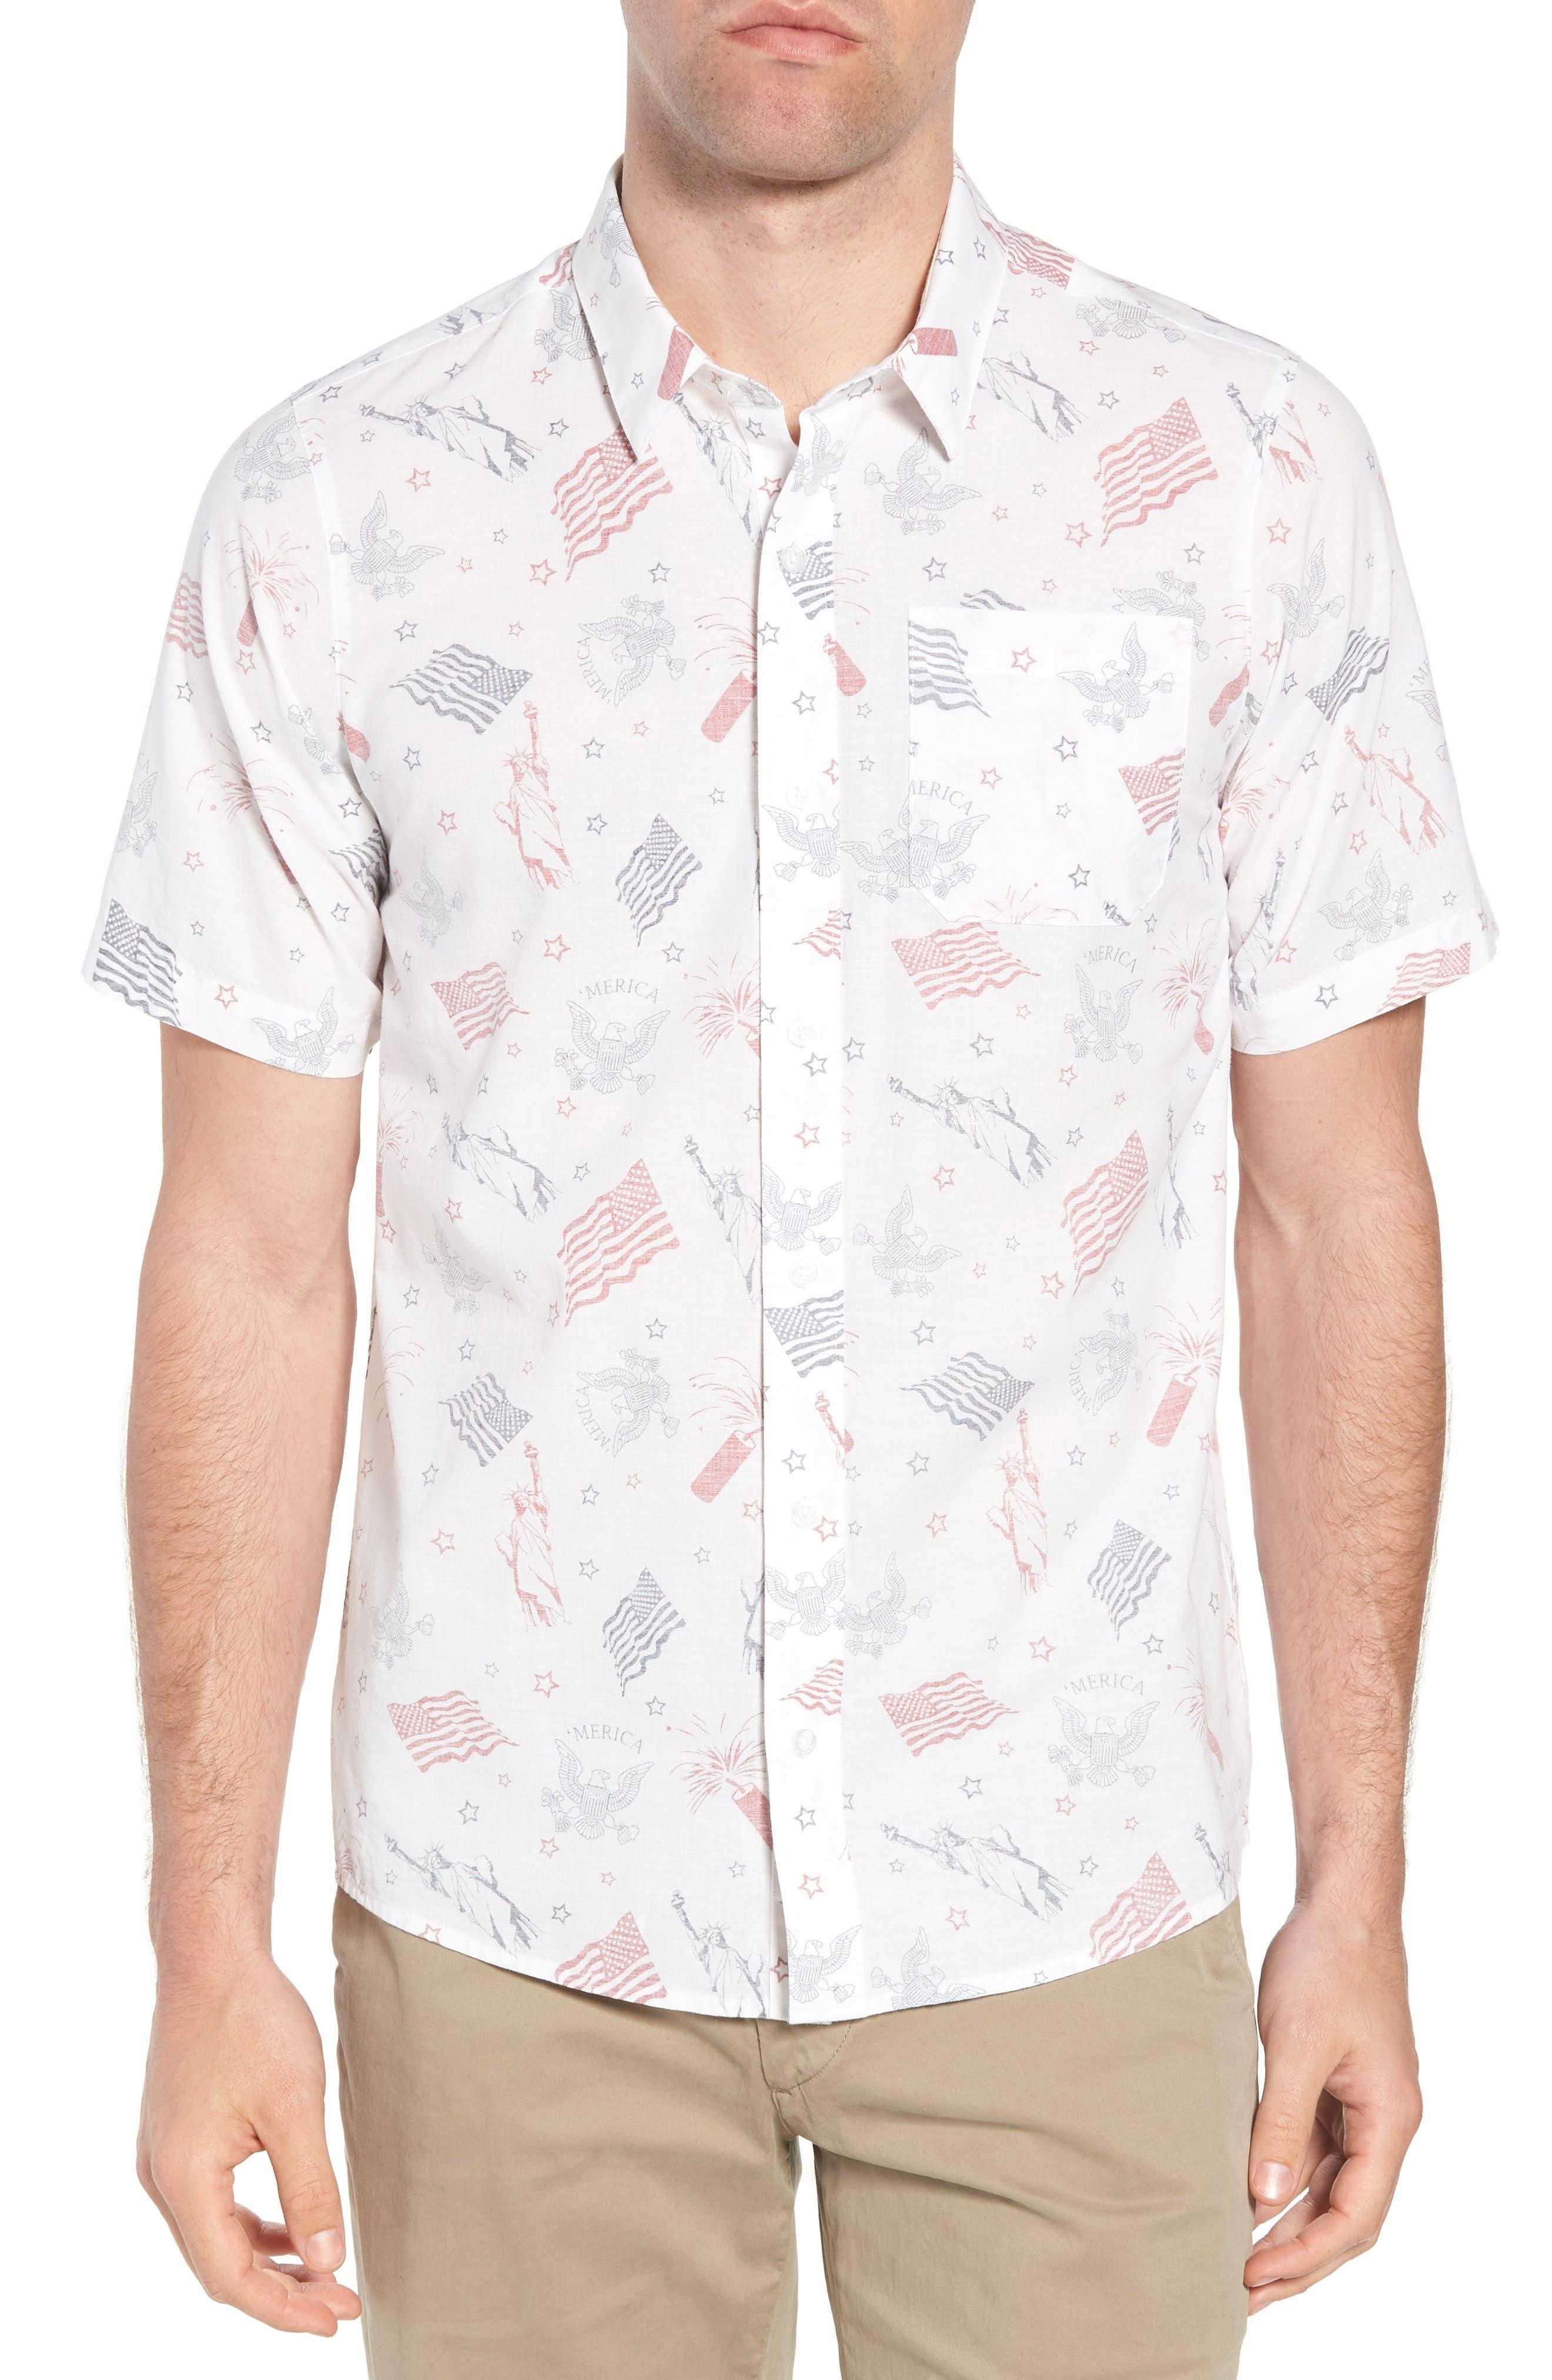 Black Cat Regular Fit Short Sleeve Sport Shirt,                             Main thumbnail 1, color,                             100